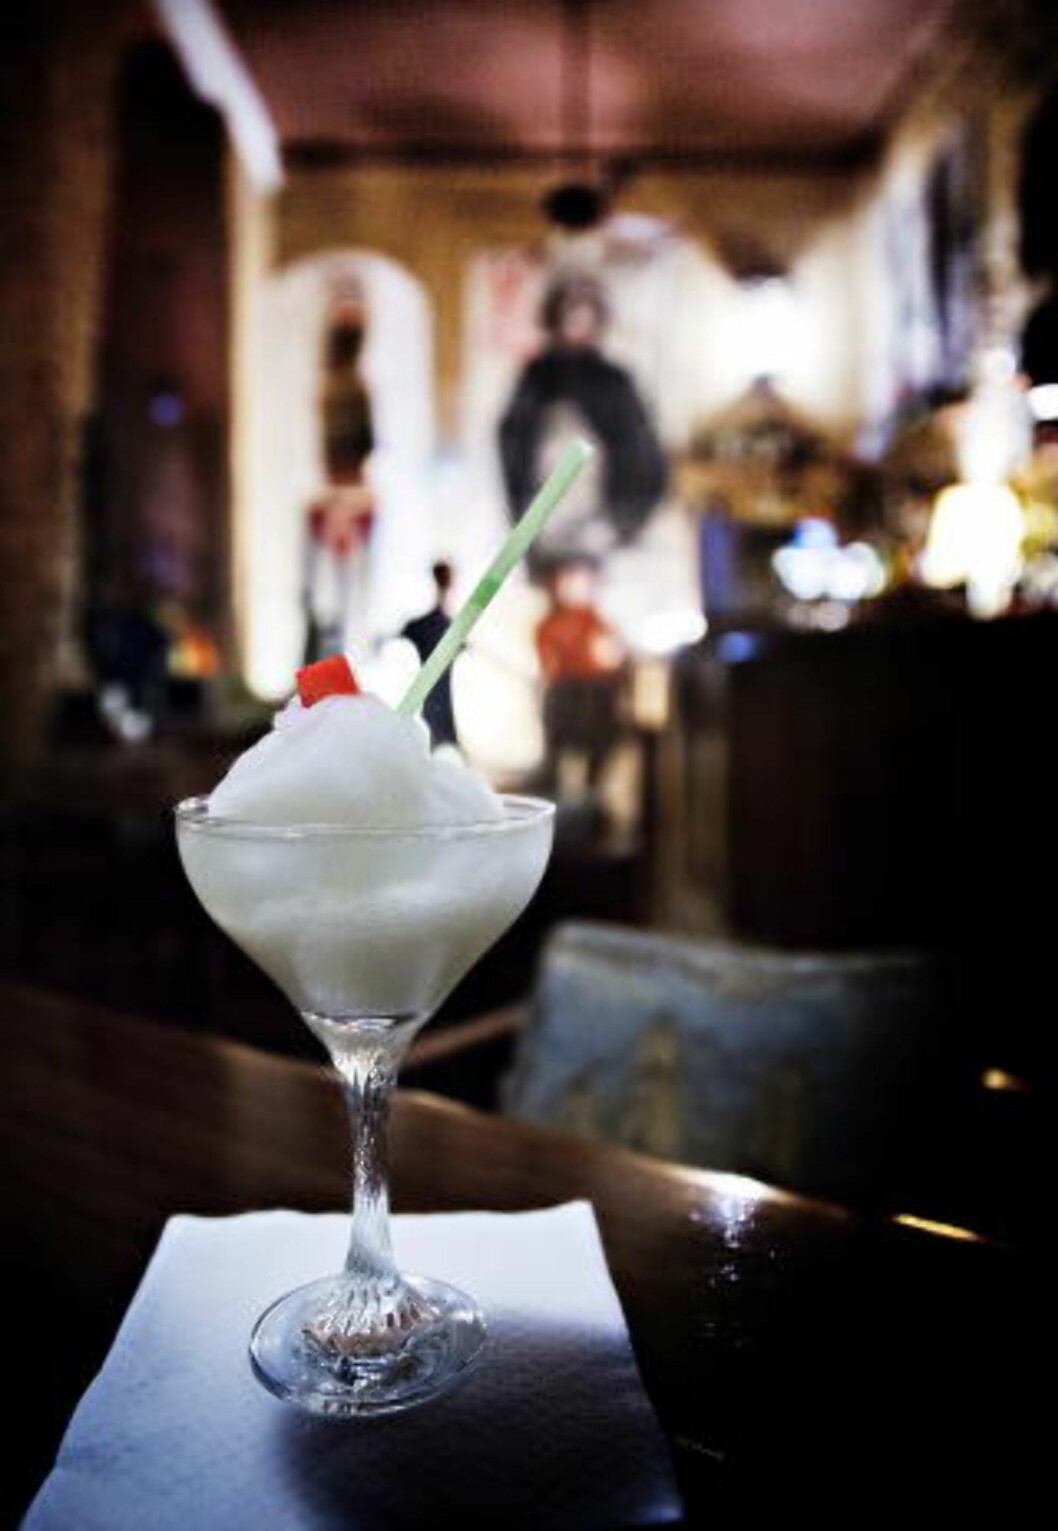 <strong>CUBANSKE DRINKER:</strong> På Madrigal i 17. gate i Vedado, kan du nyte en daiquiri. Foto: NINA HANSEN